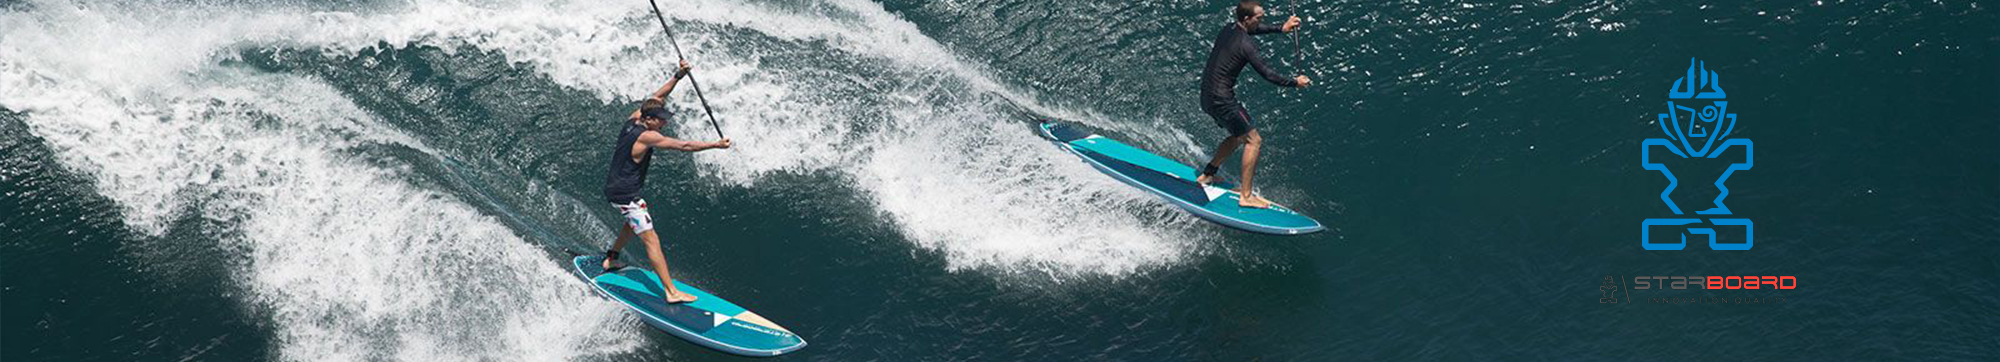 Starboard-SUP-Header